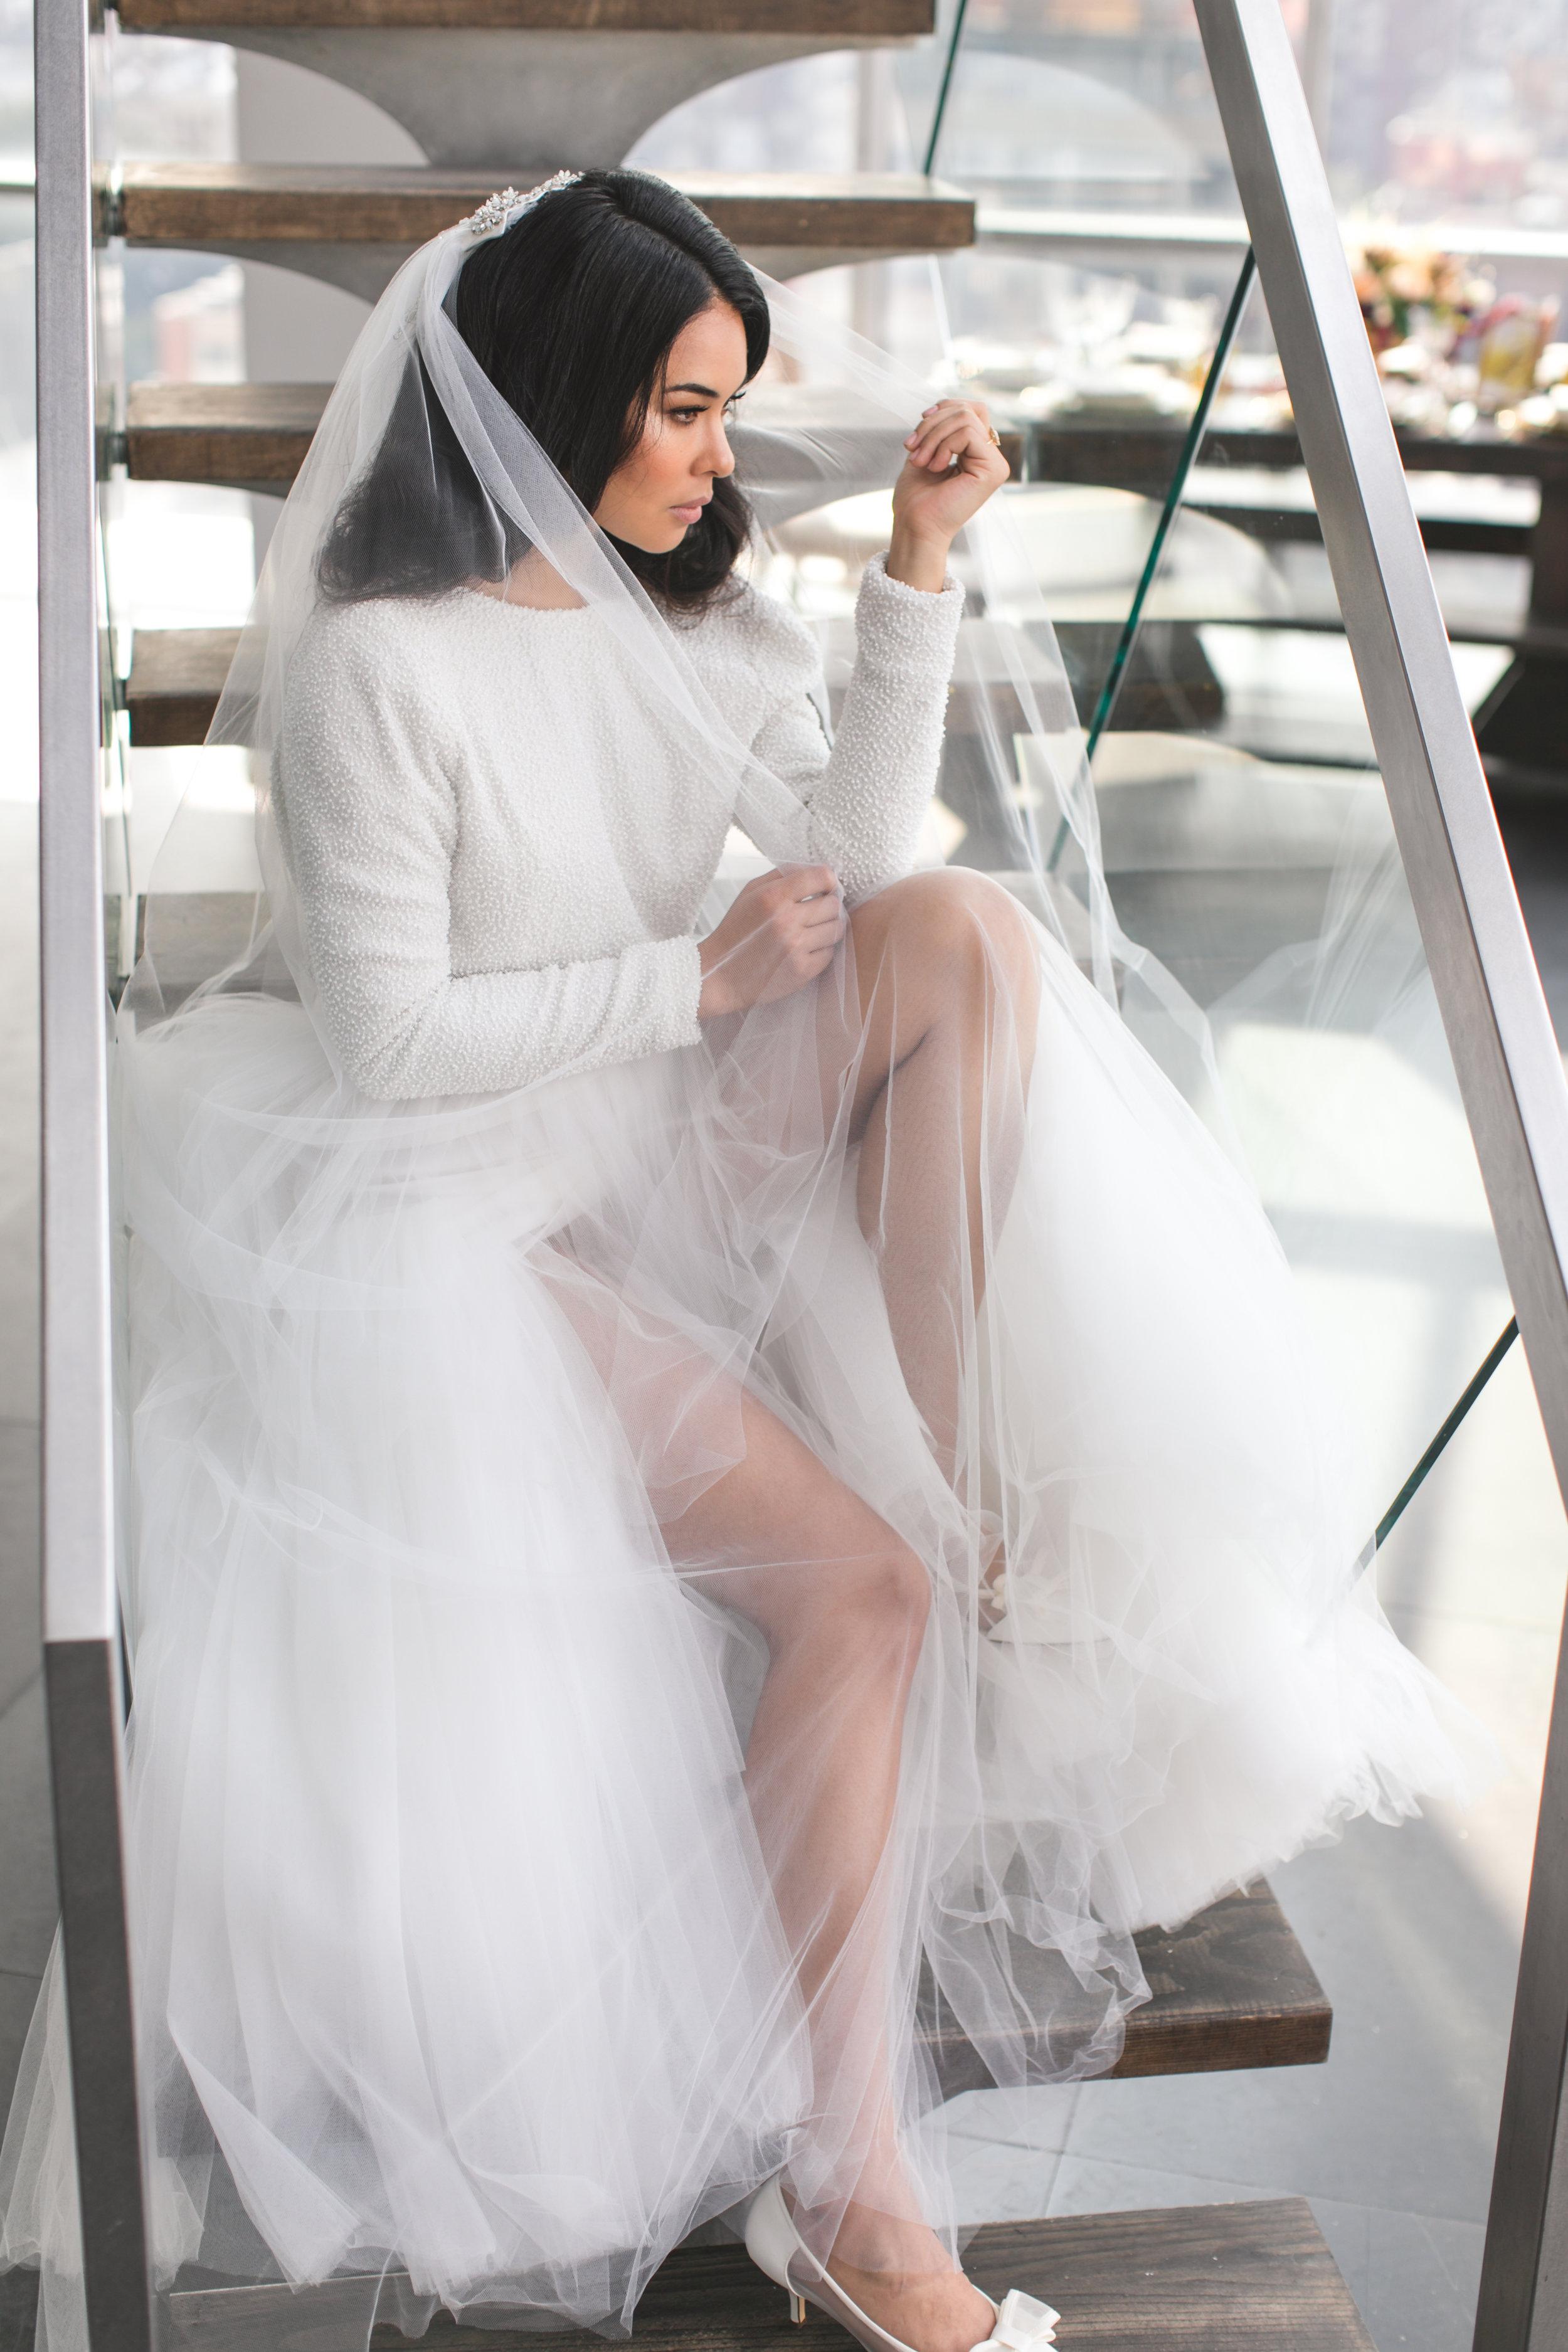 Bond_Girl_Bride_GinaEsposito-8.jpg